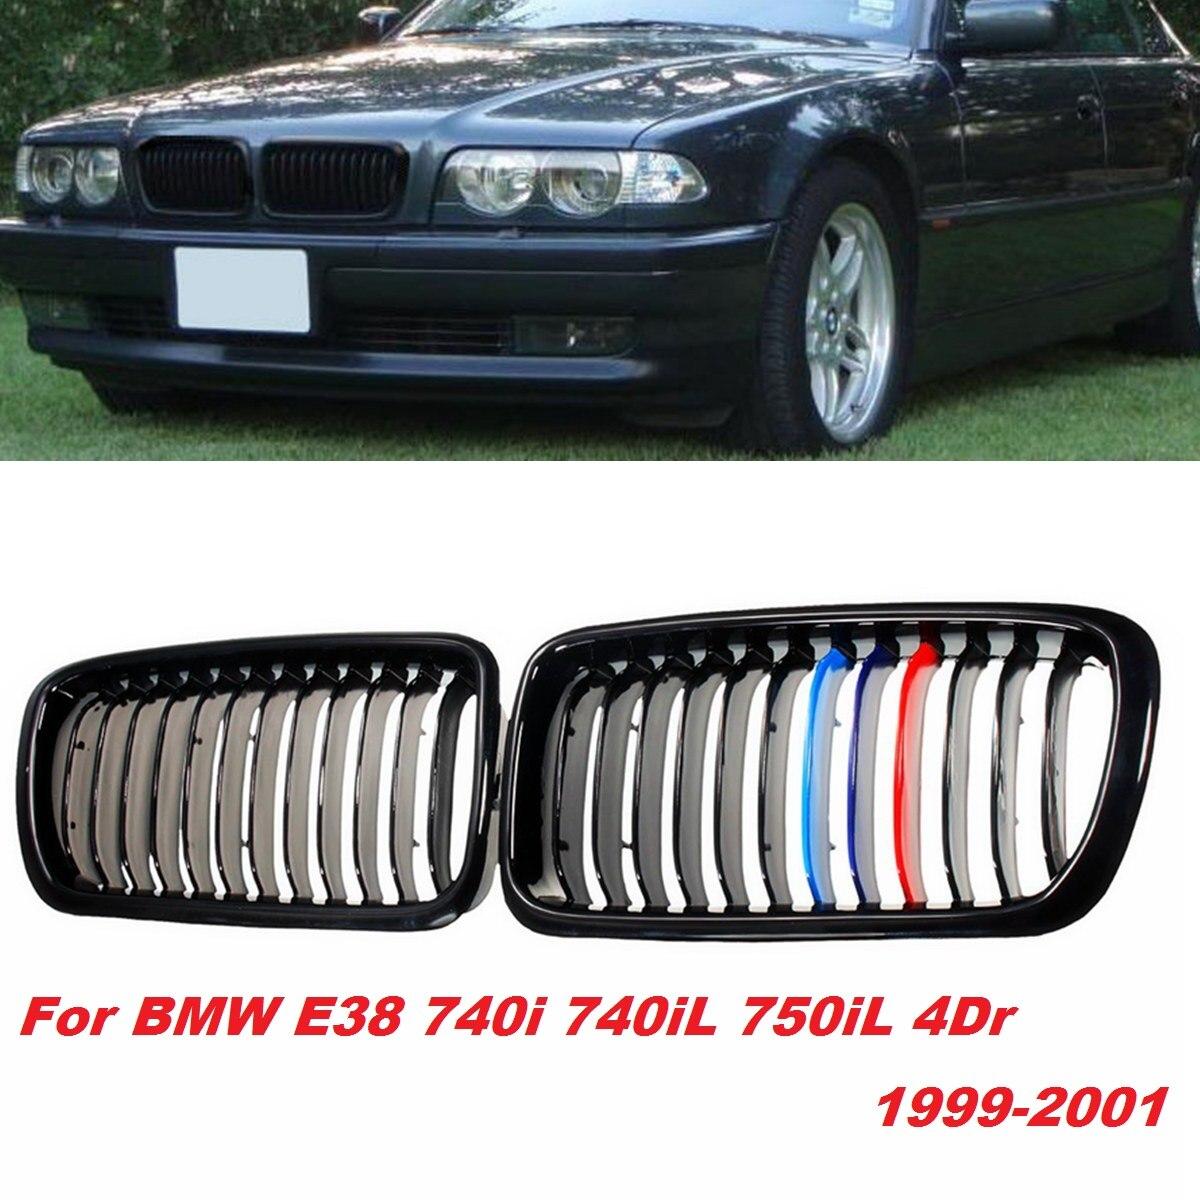 1996 1997 1998 1999 2000 2001 BMW E38 740i M3 SPORT FRONT WHEEL OEM